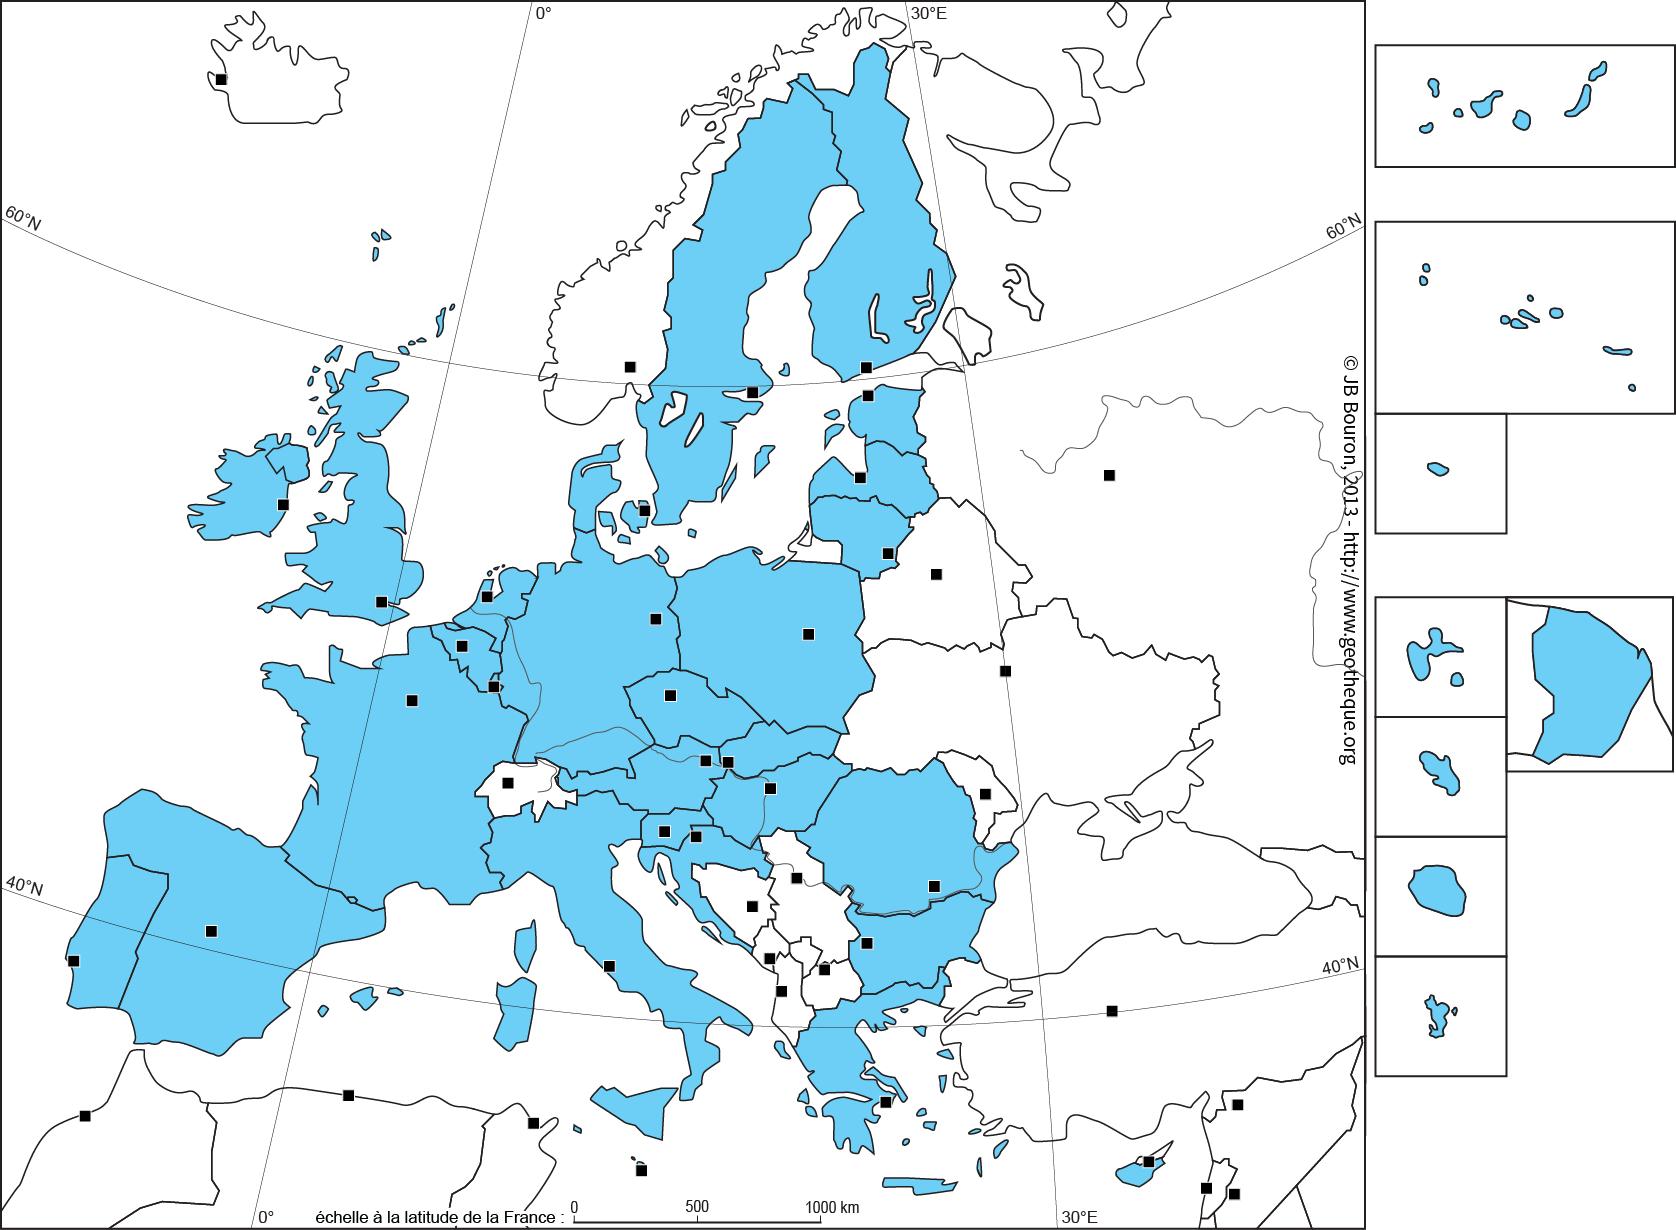 Fond De Carte De L'union Européenne À 28 - Ue28 - Eu28 Map encequiconcerne Carte Union Europeene